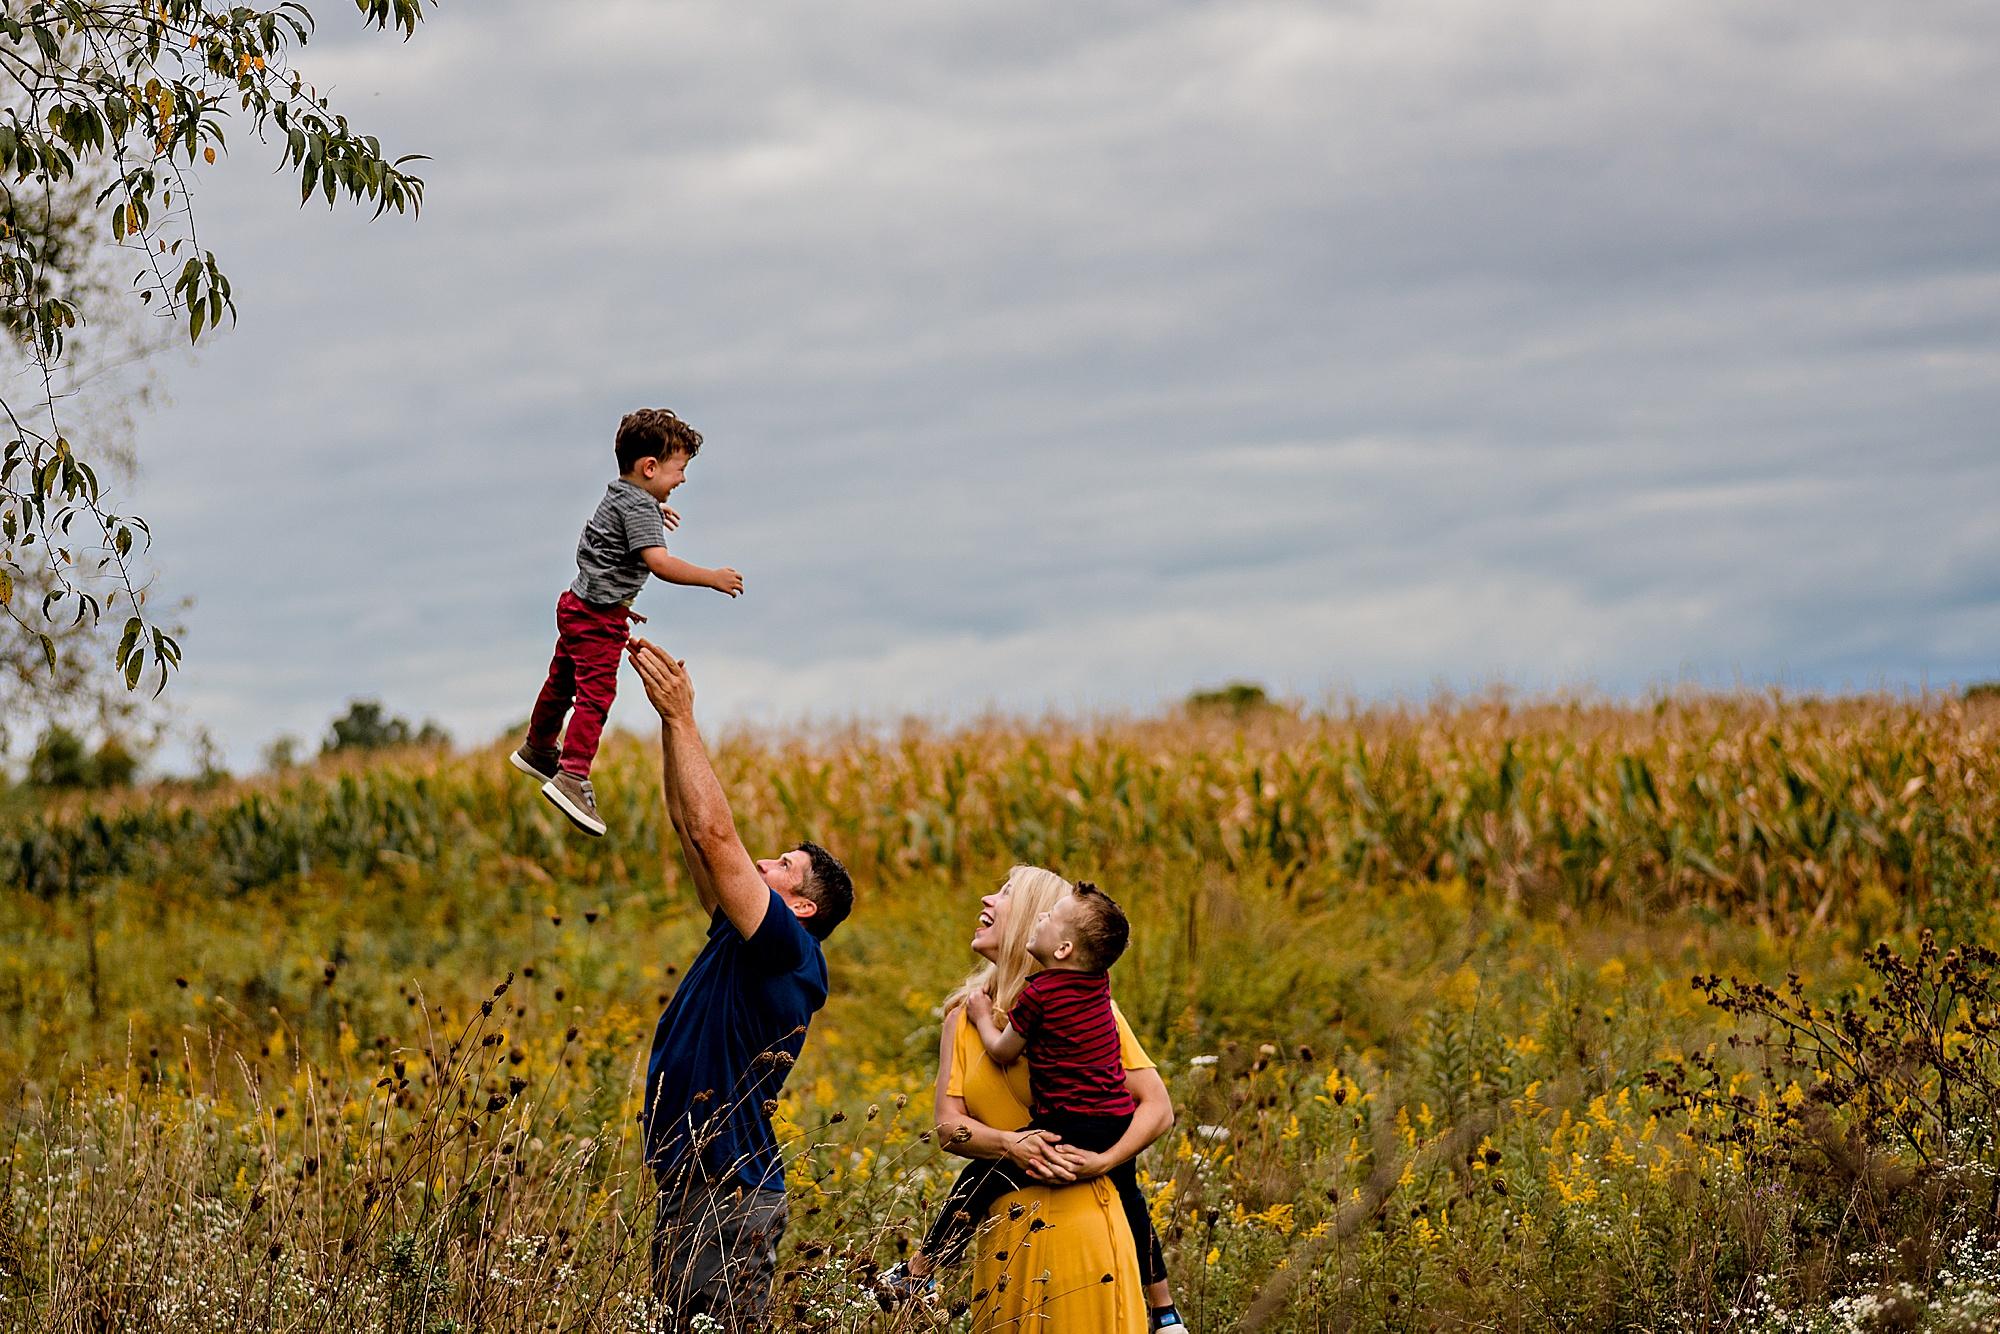 lauren-grayson-photography-akron-ohio-best-family-photos-2018-cleveland_0009.jpg